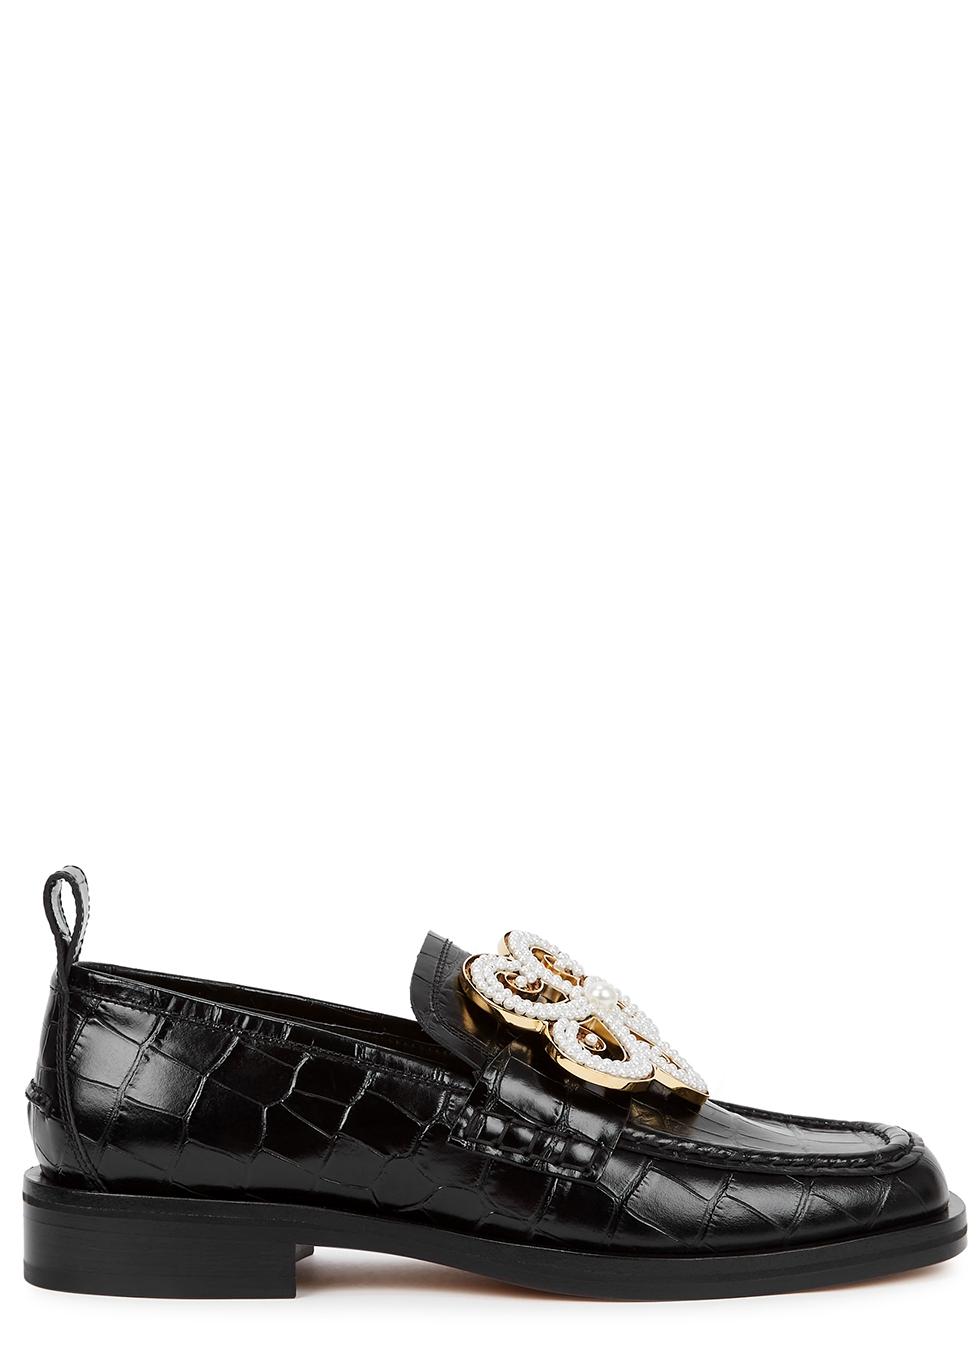 Black embellished crocodile-effect leather loafers